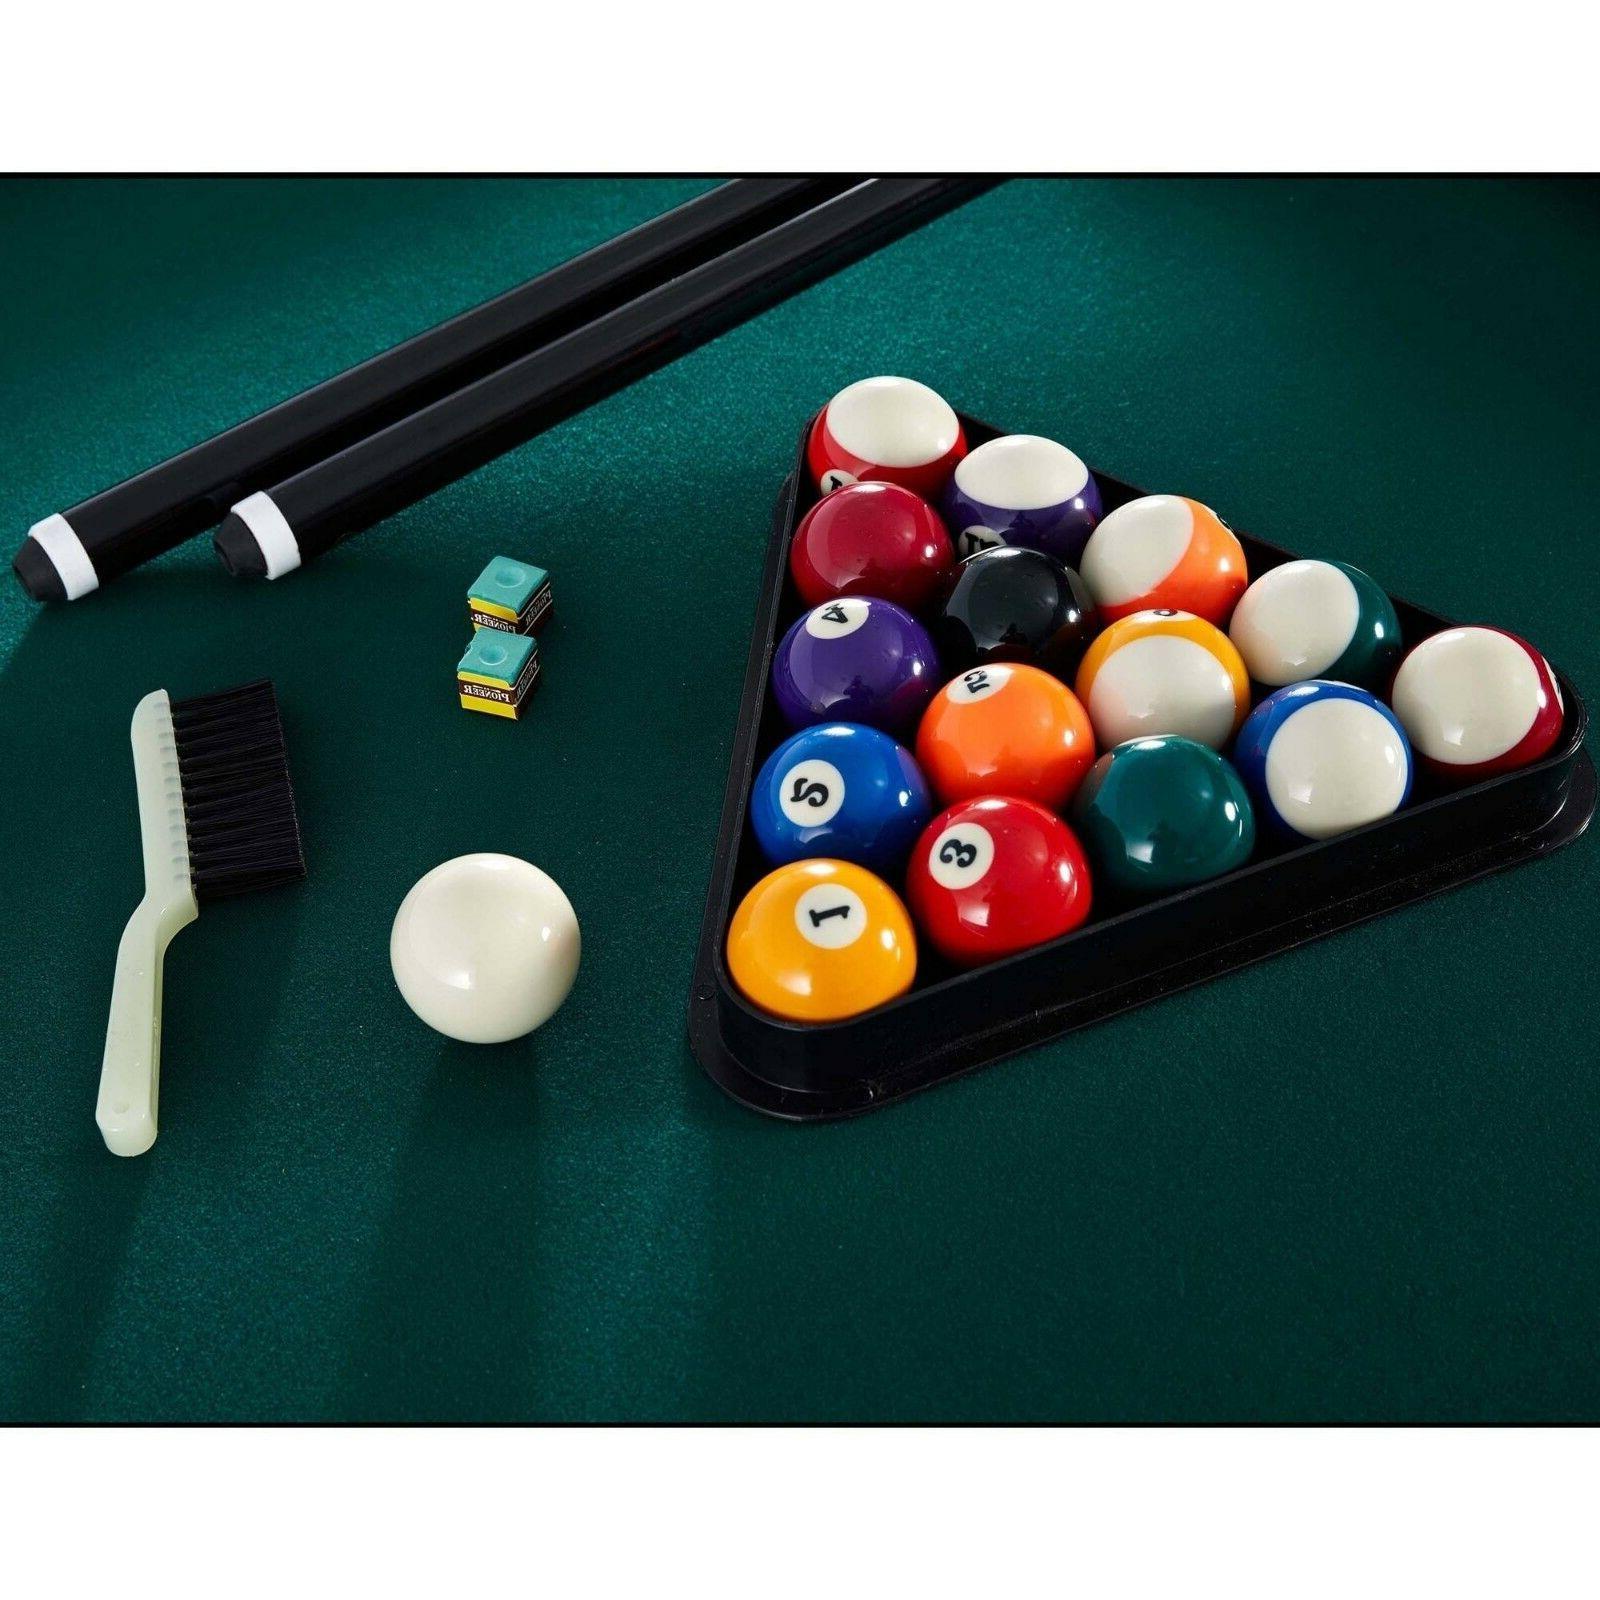 Pool 84-inch Billiard Cues Table Bonus Set